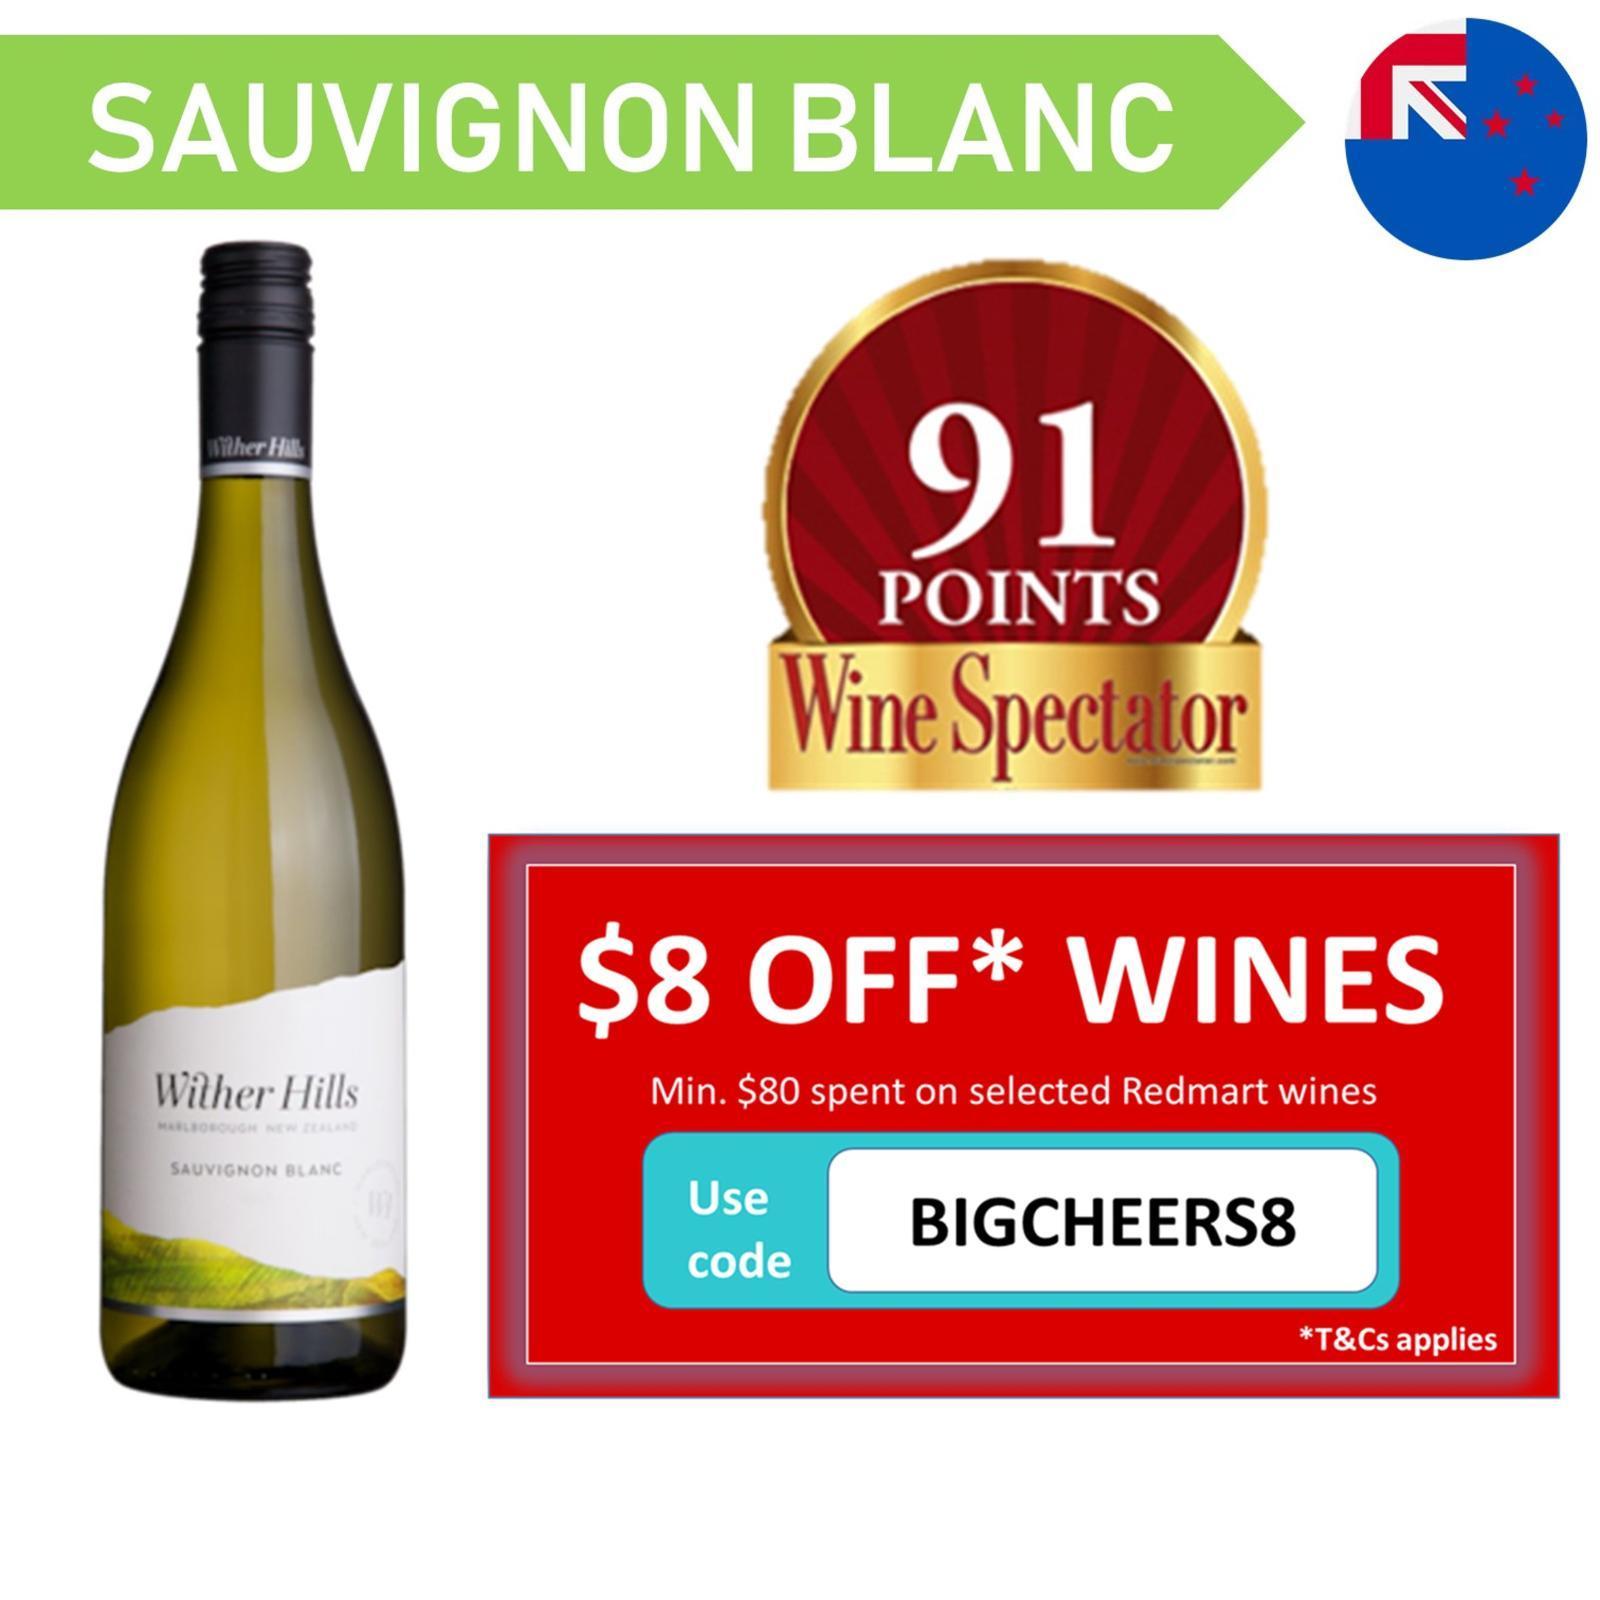 Wither Hills Wairau Valley Marlborough Sauvignon Blanc